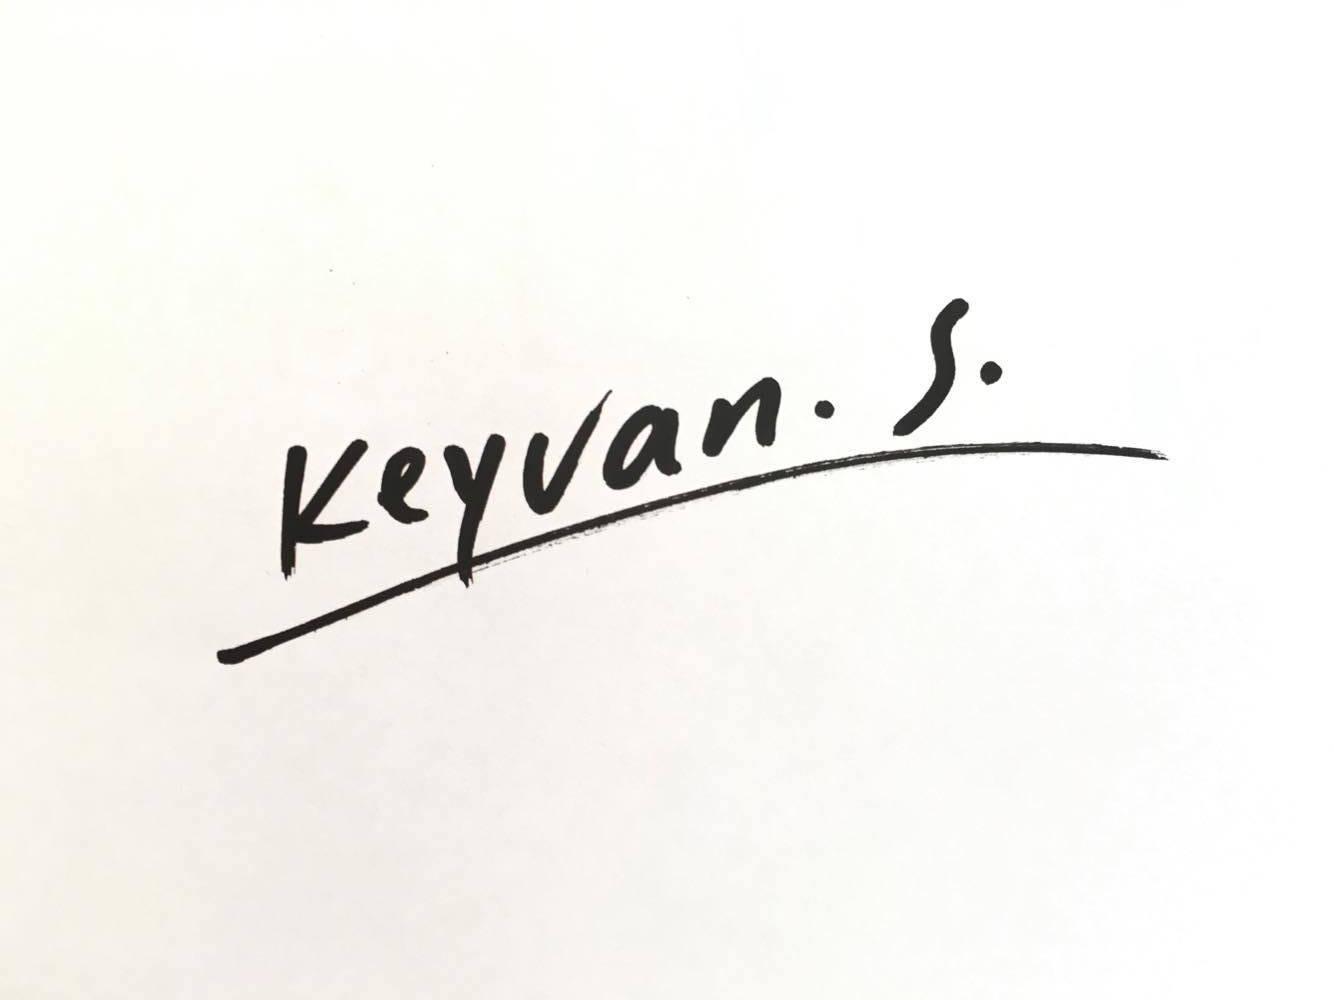 Keyvan S.'s Signature